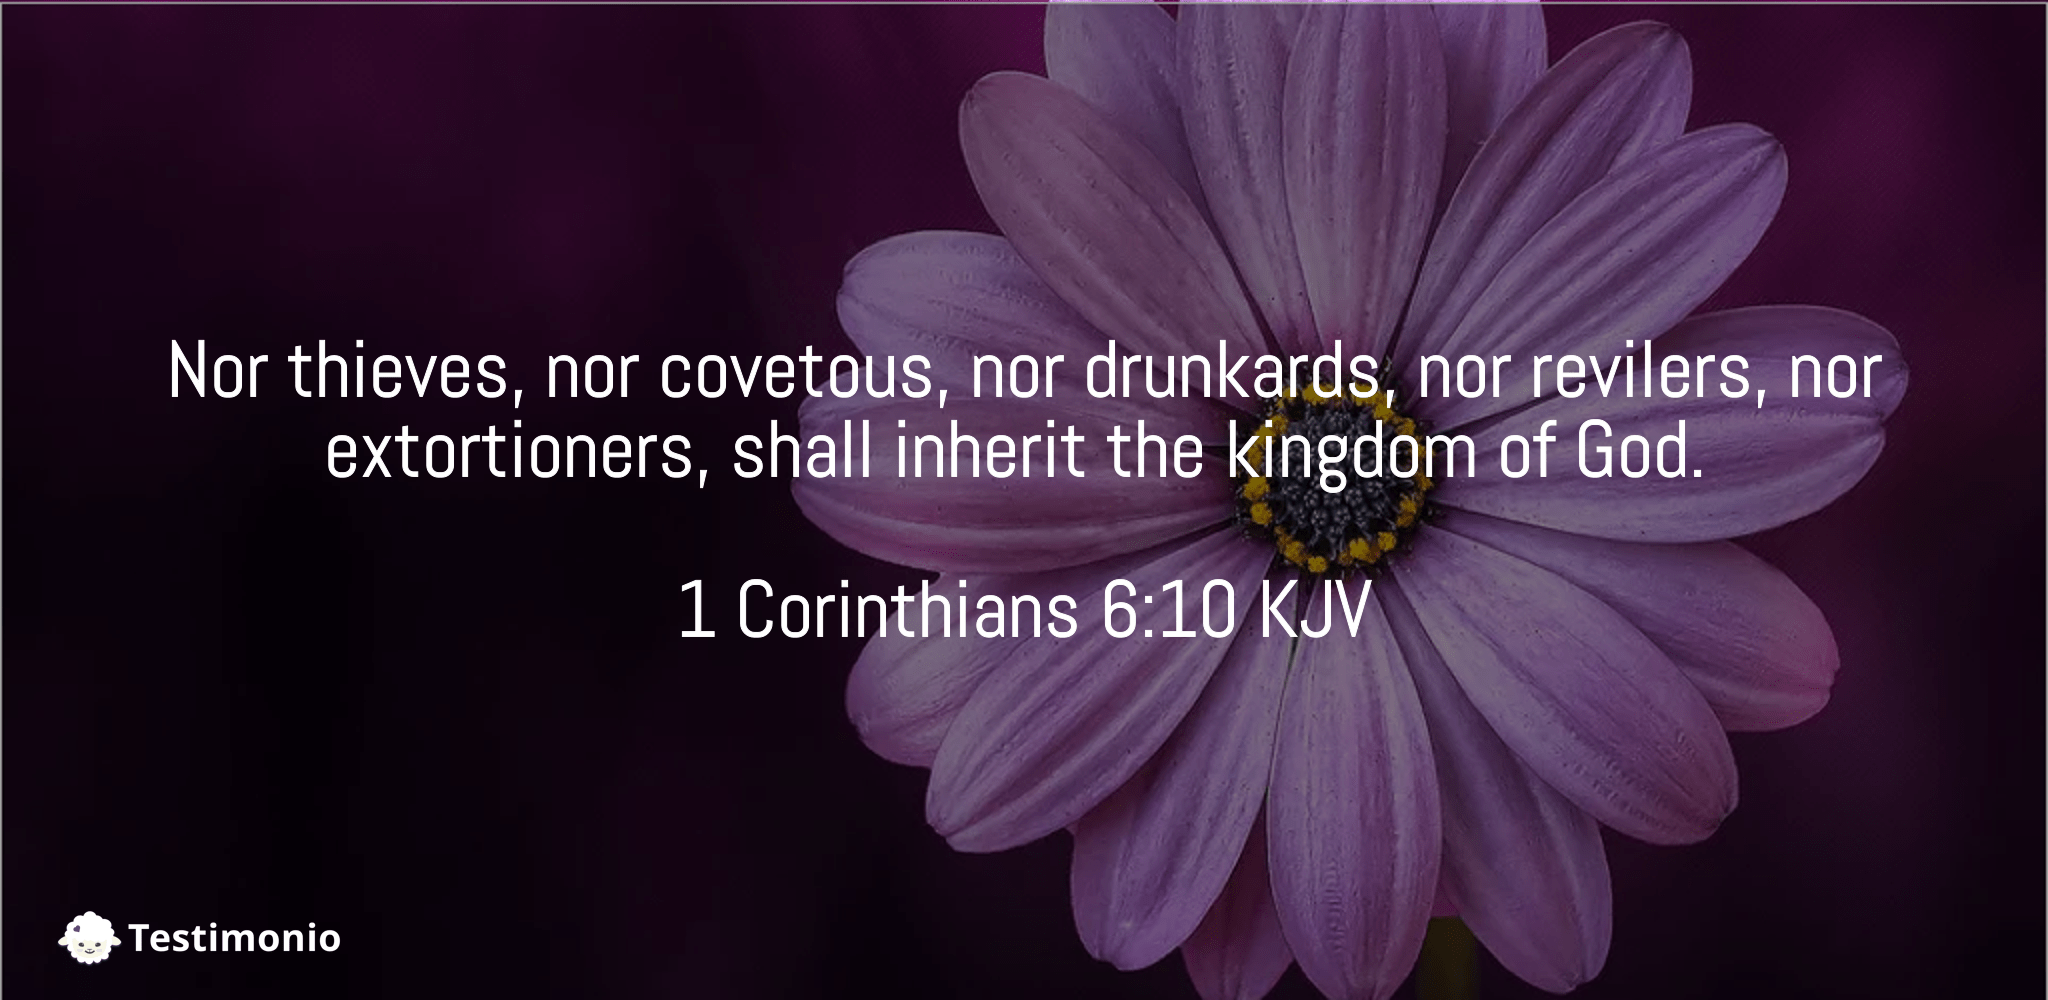 1 Corinthians 6:10